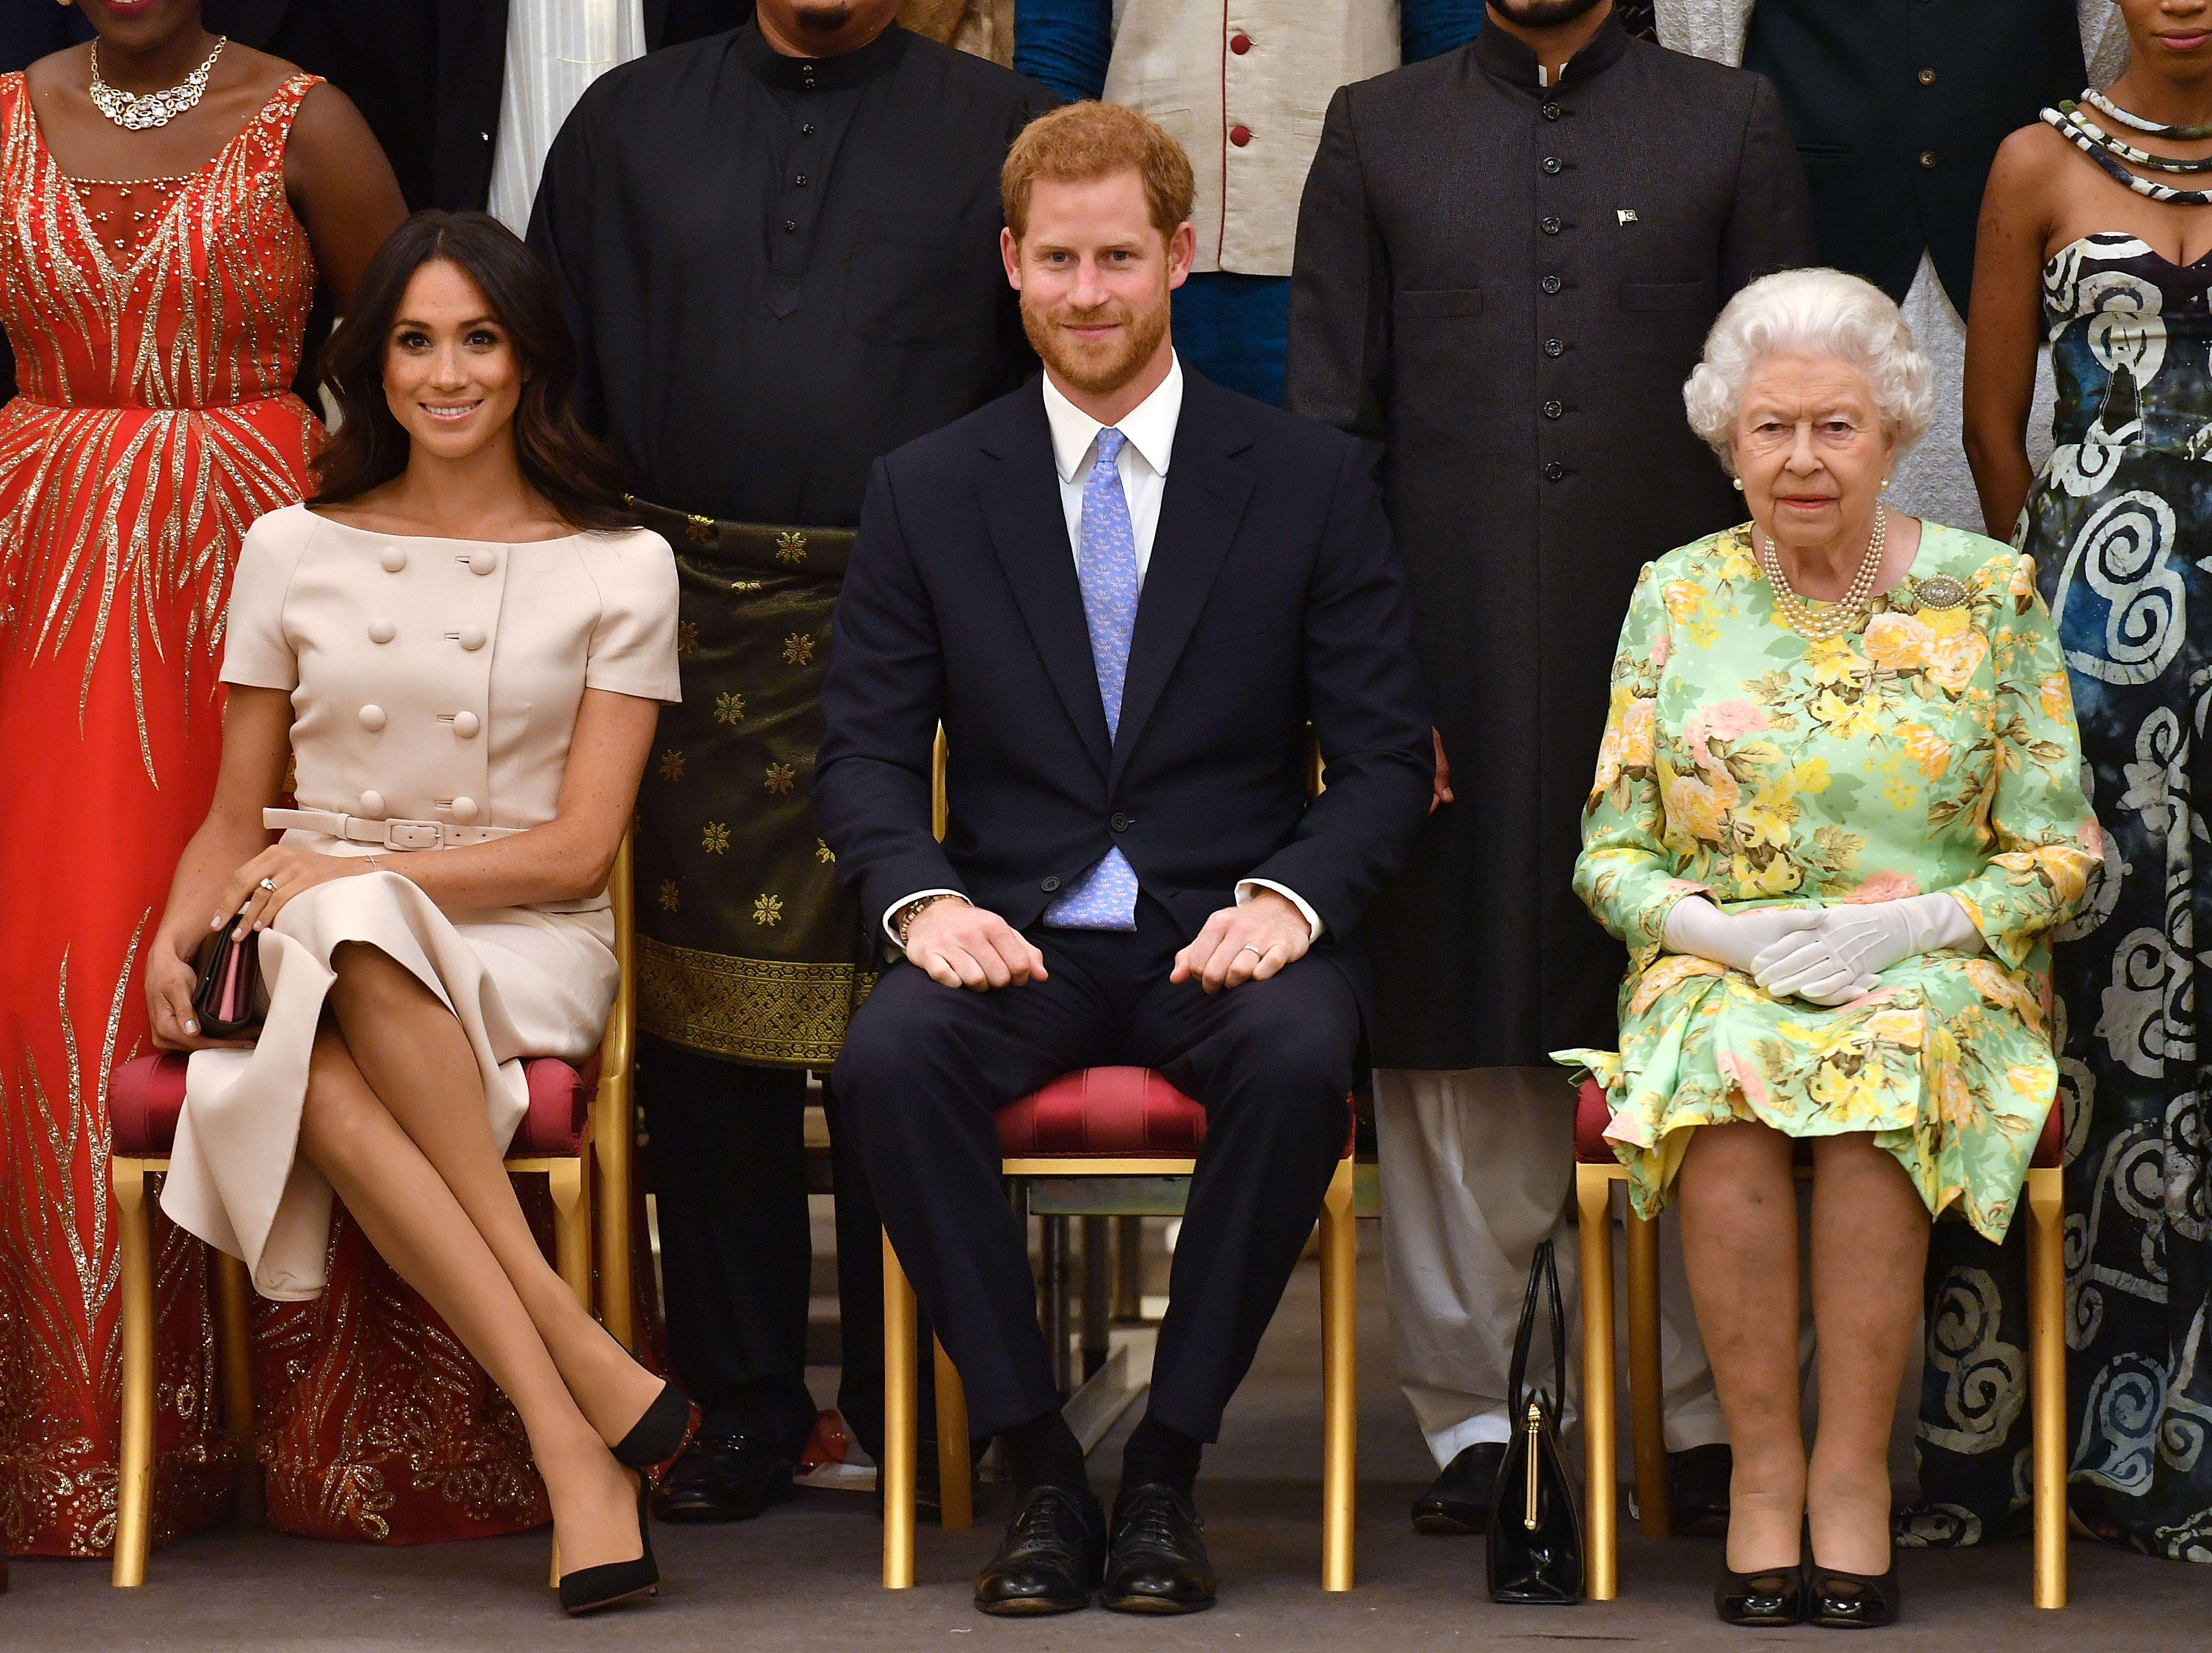 Prince Harry, Meghan Markle, Queen Elizabeth II